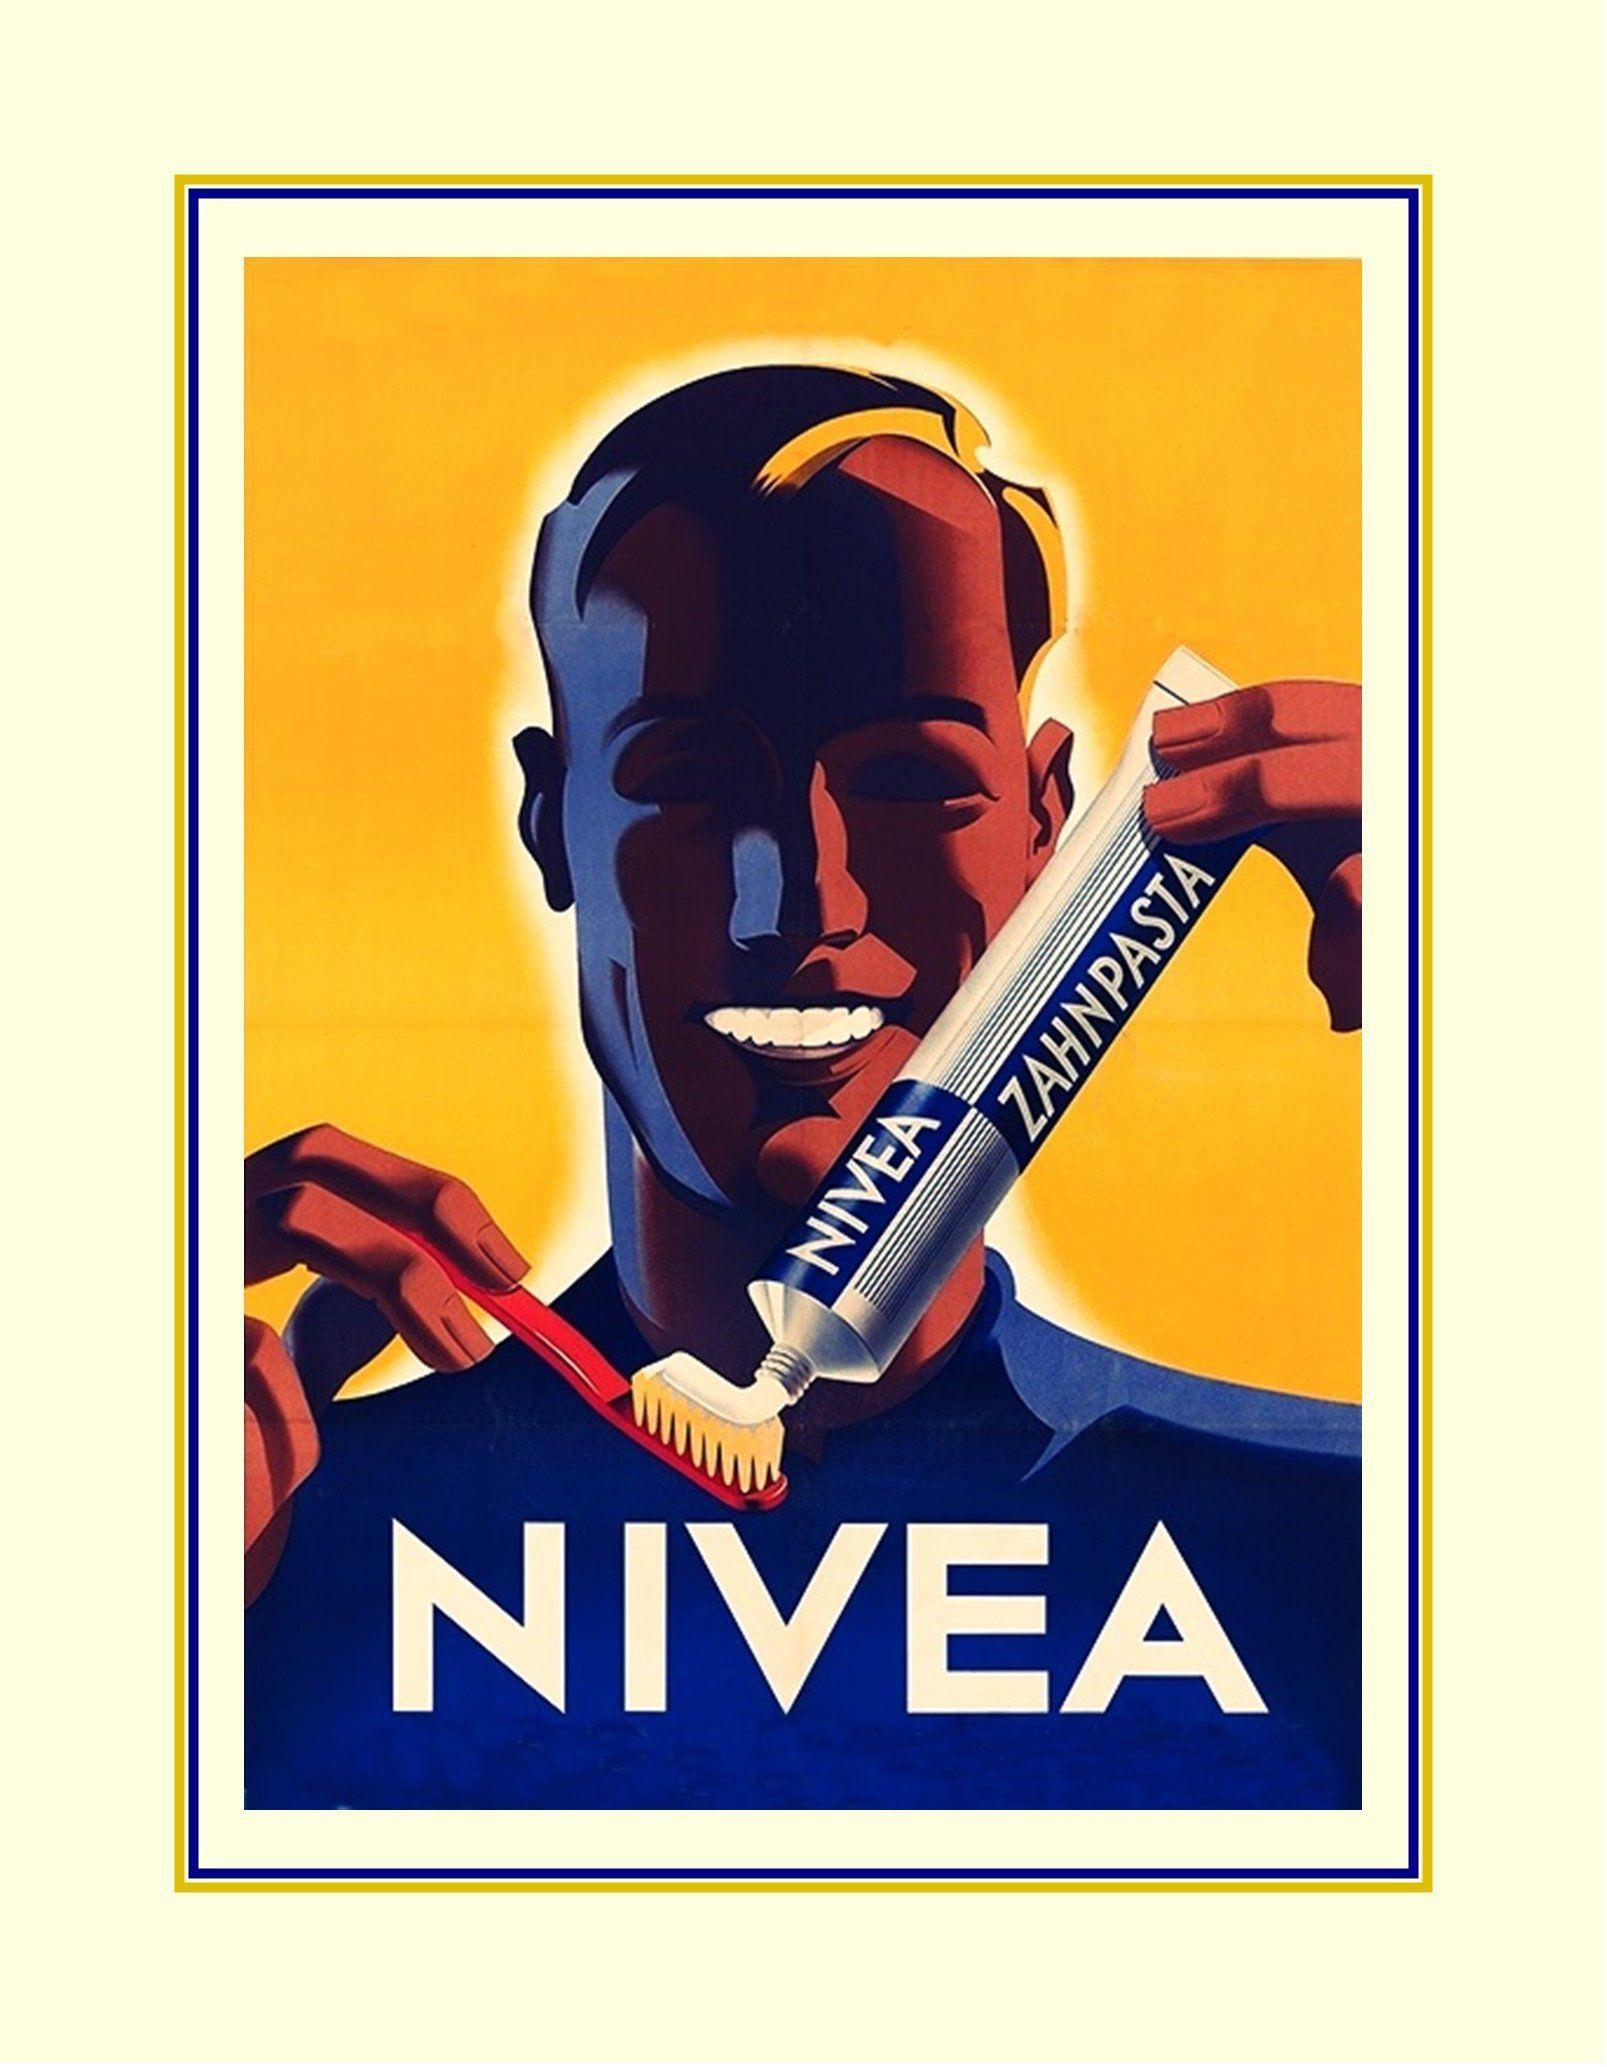 Gold Nivea Dental Soap Poster, Blue Bathroom Illustration Wall Art ...